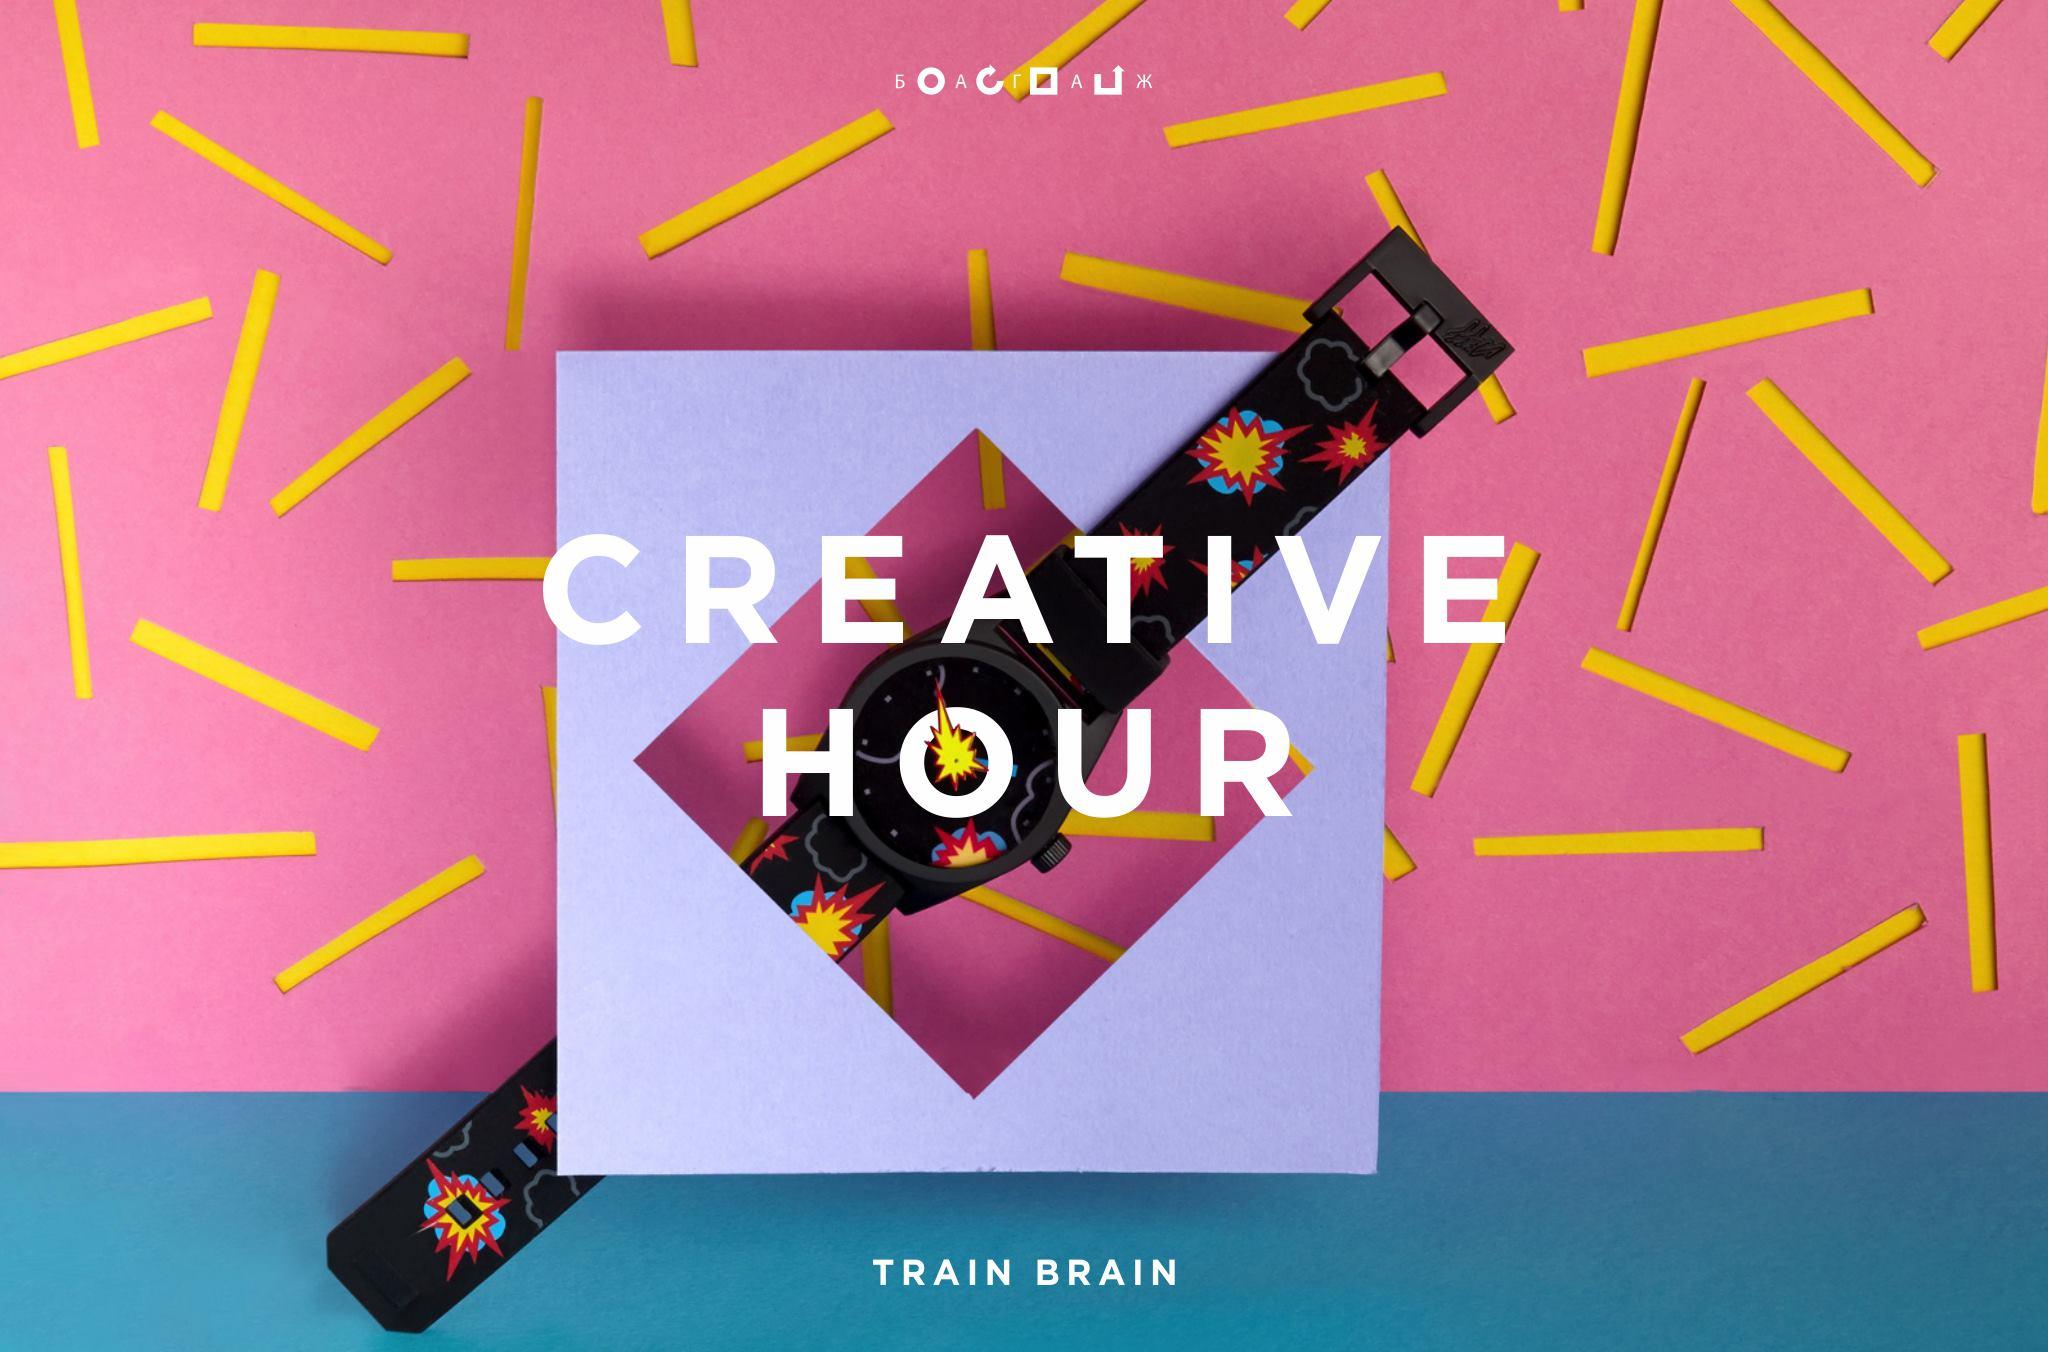 45_august_2017_CREATIVE HOUR